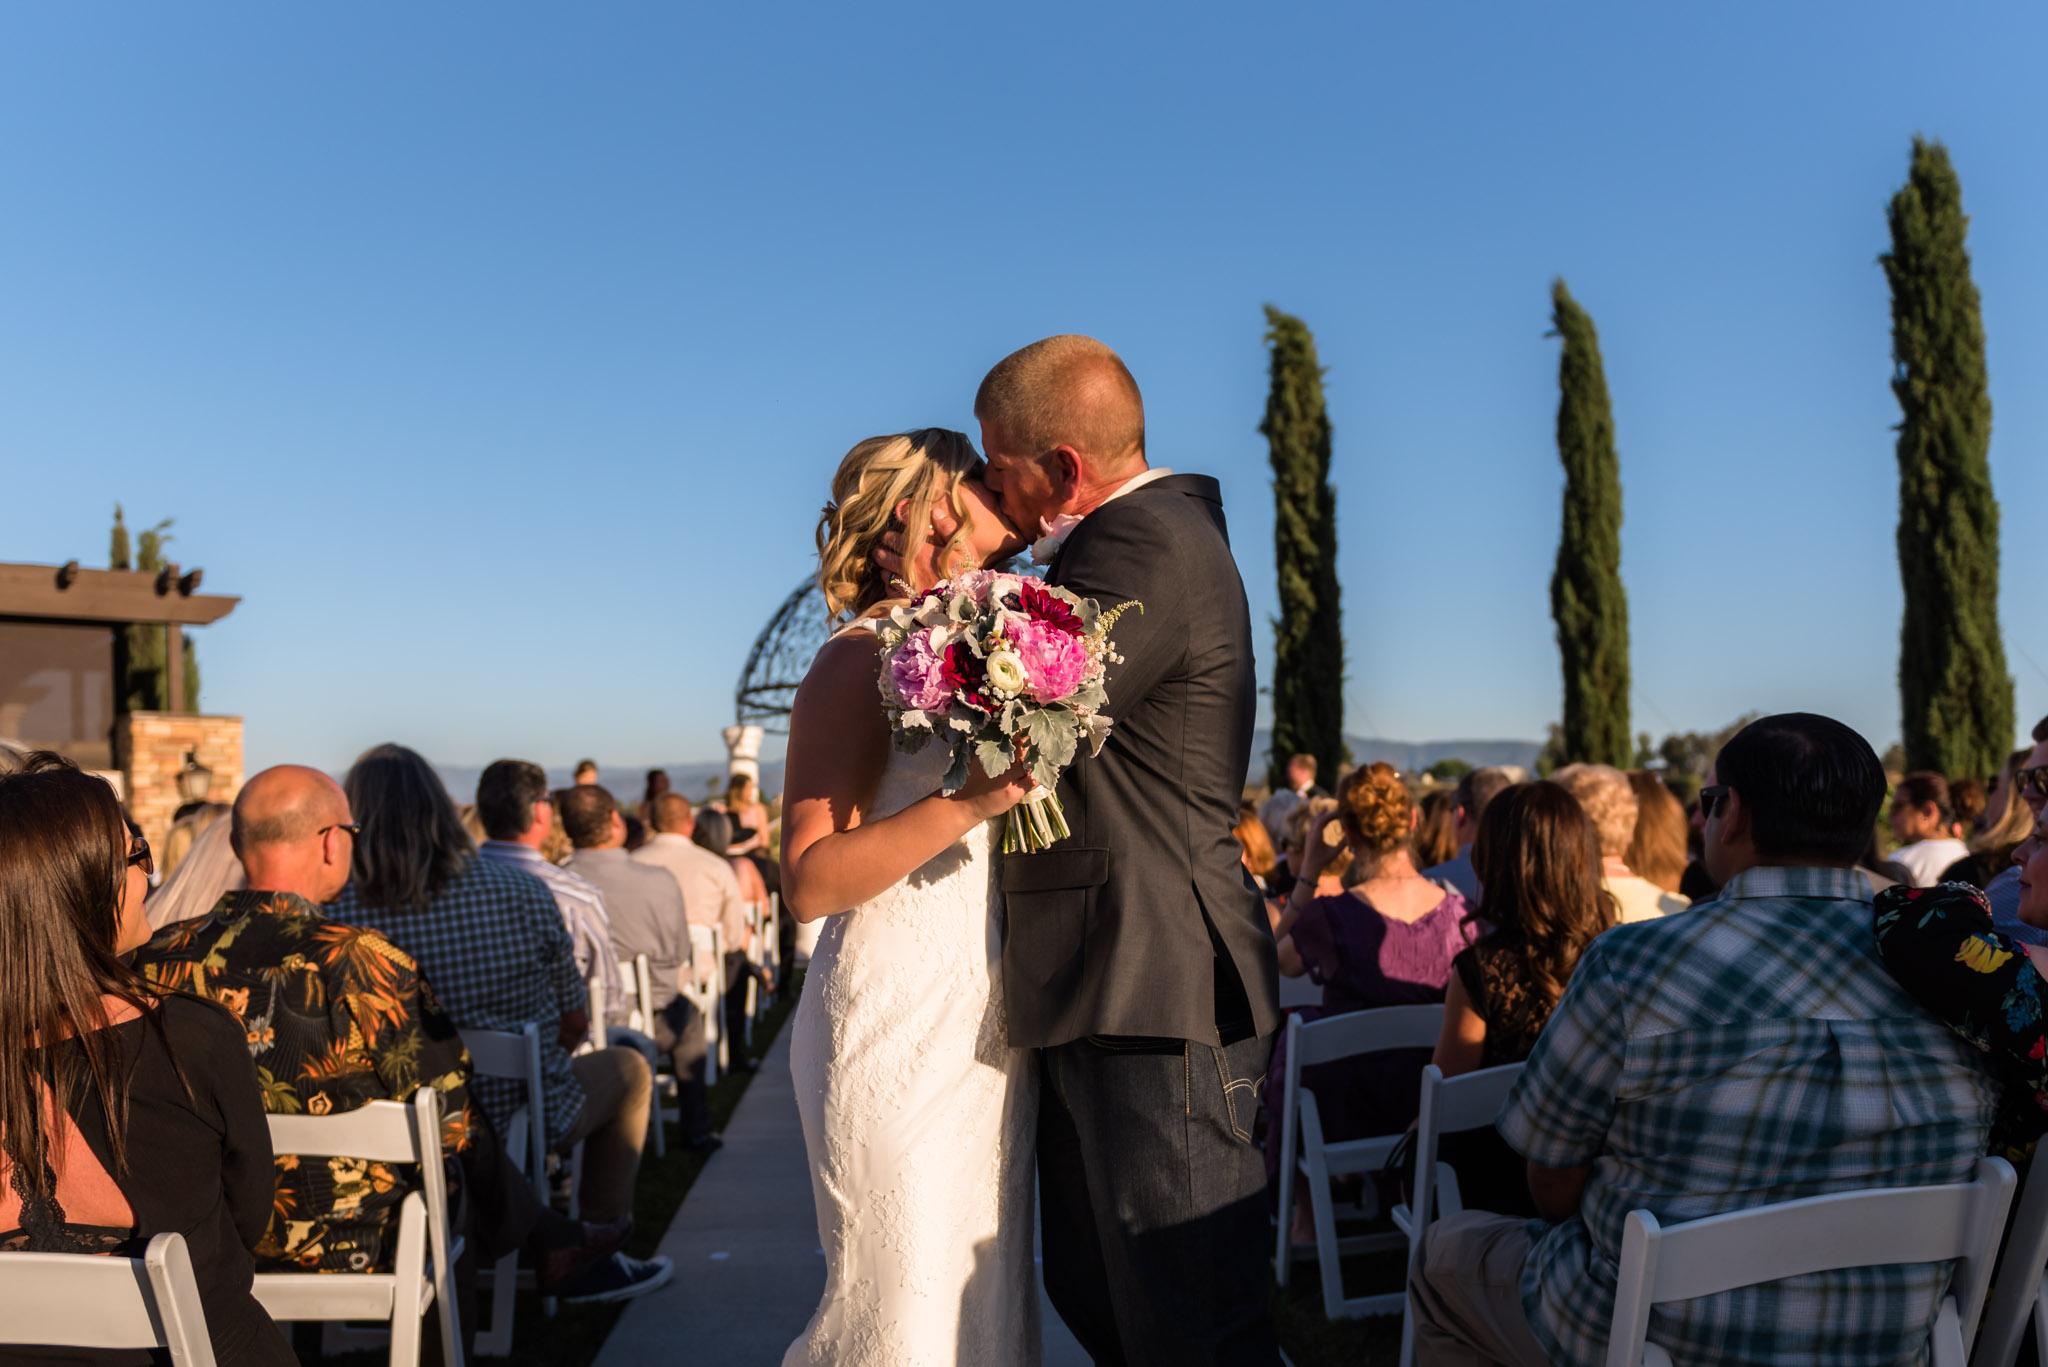 Avensole-Winery-Temecula-Wedding-Josh-and-Olivia-3644.JPG